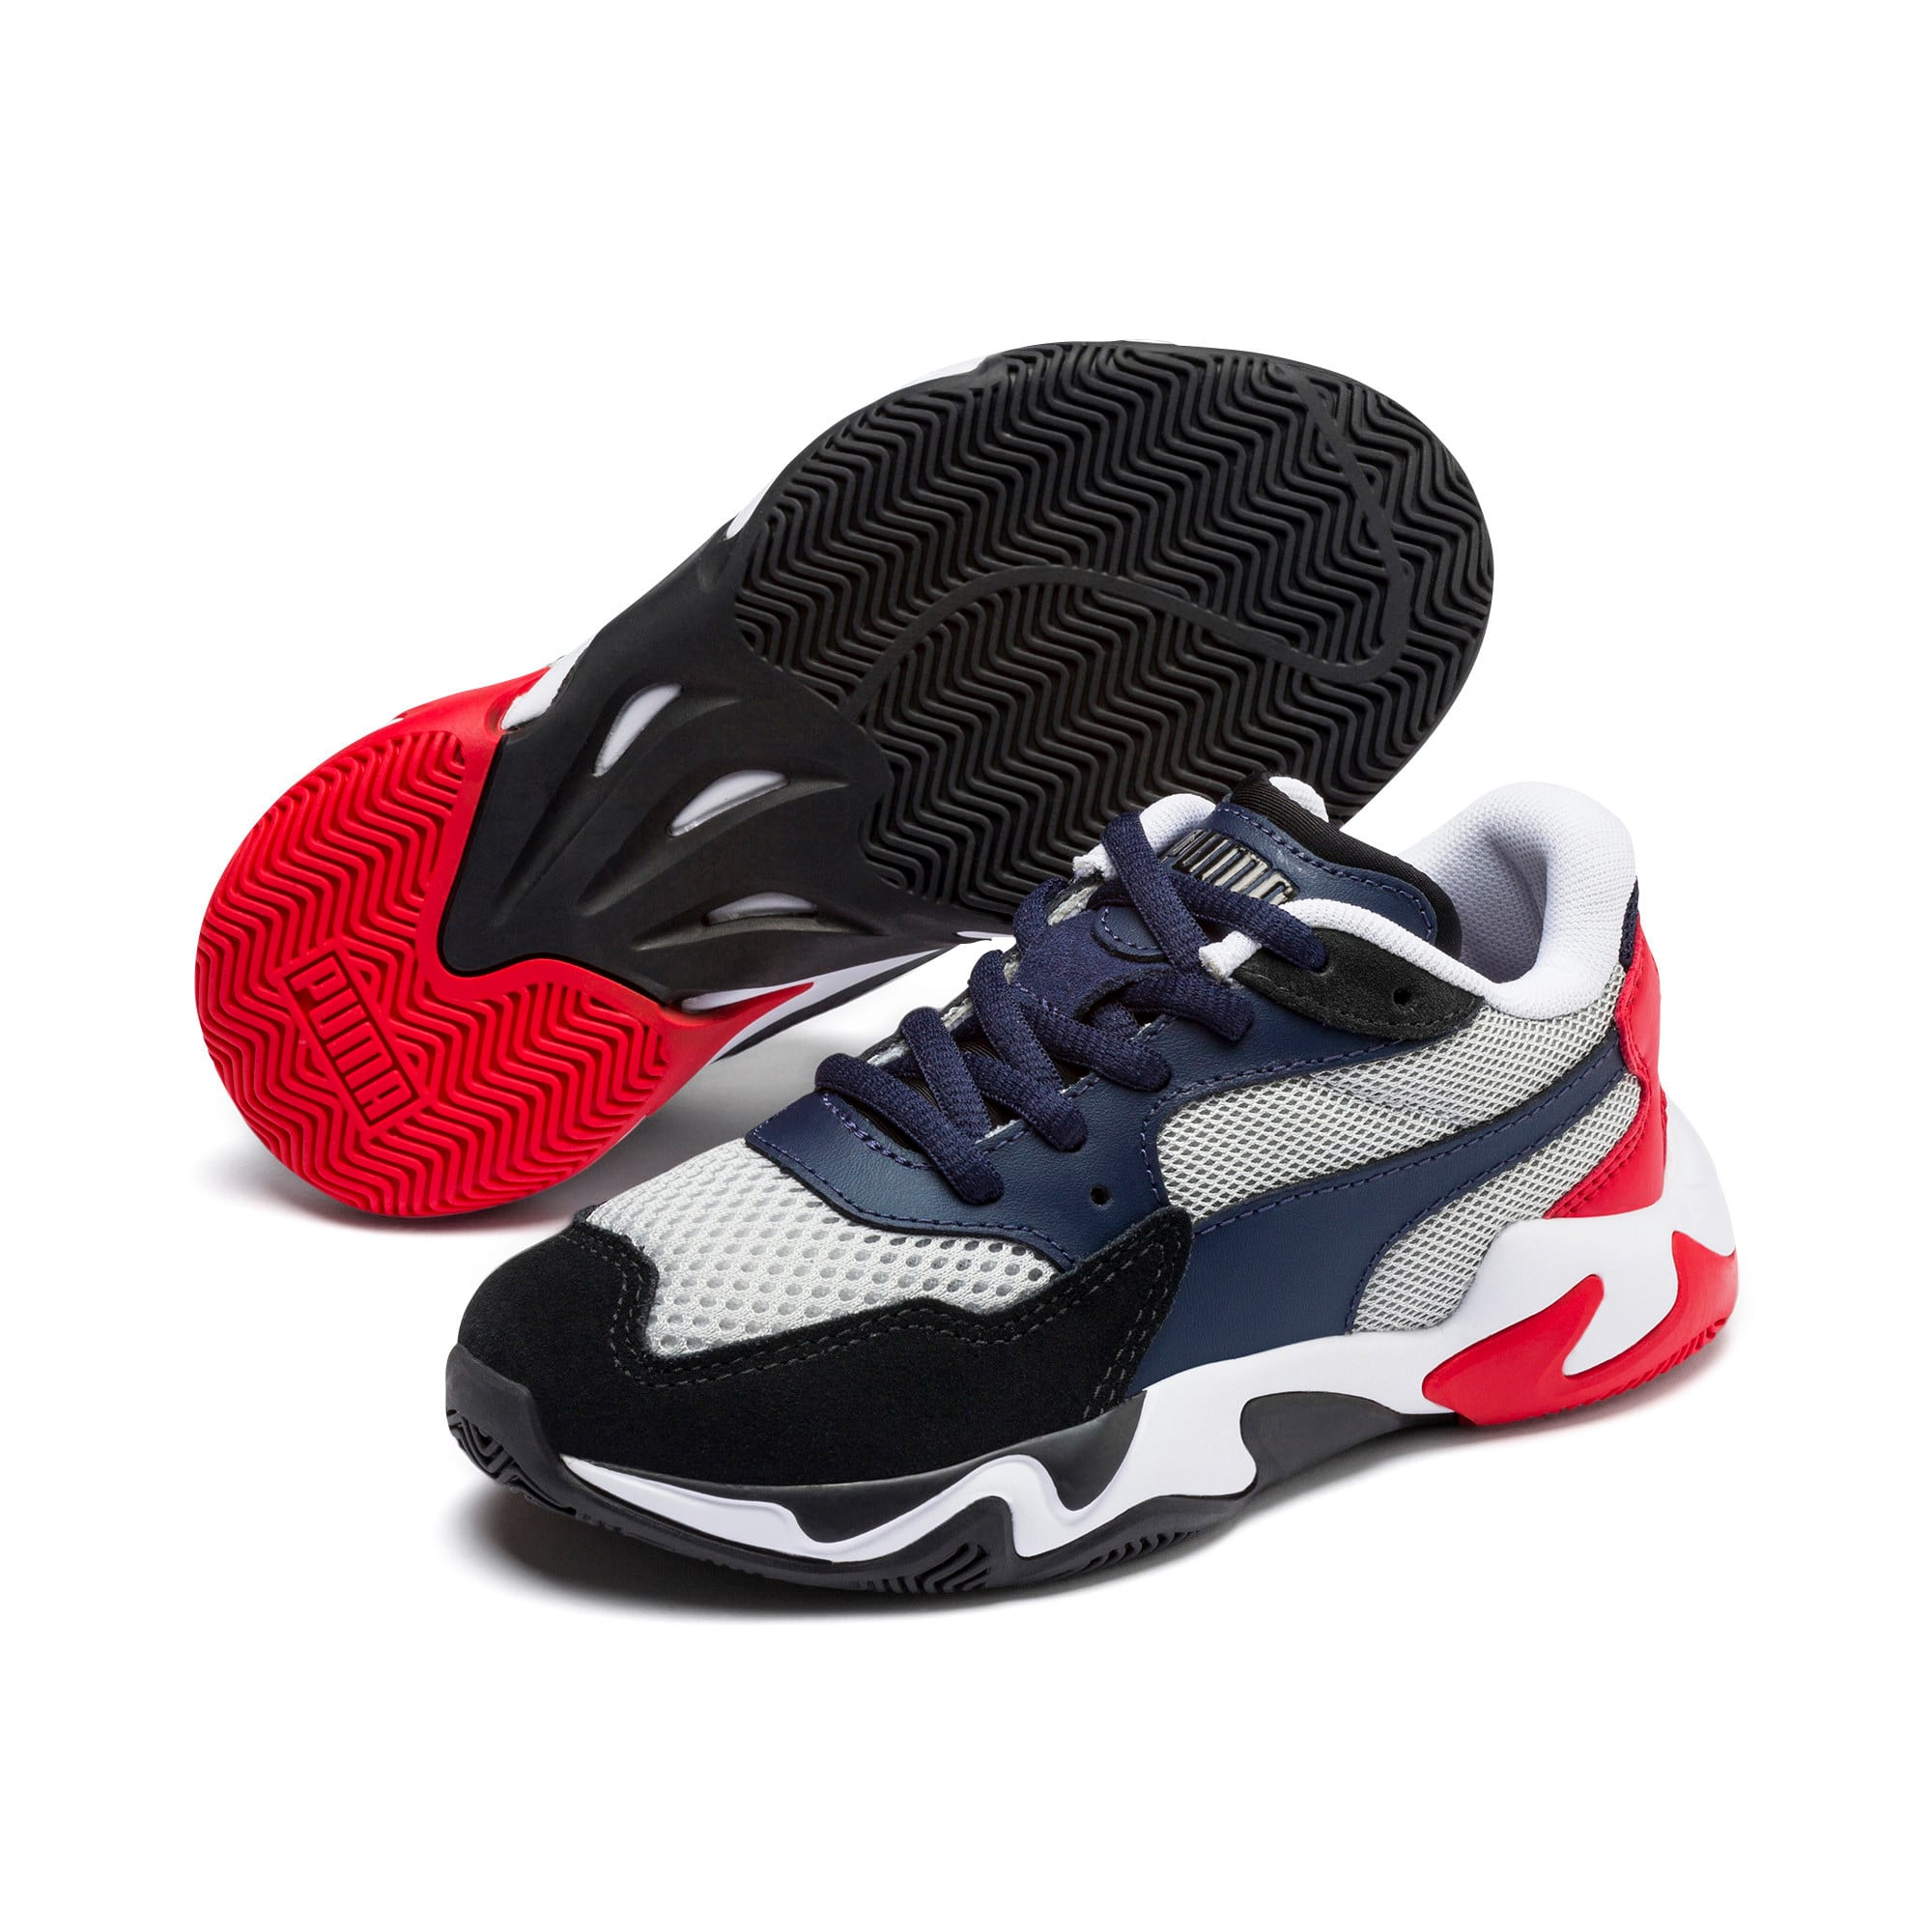 Imagen en miniatura 2 de Zapatillas de niño Storm Origin, Puma Black-High Rise, mediana